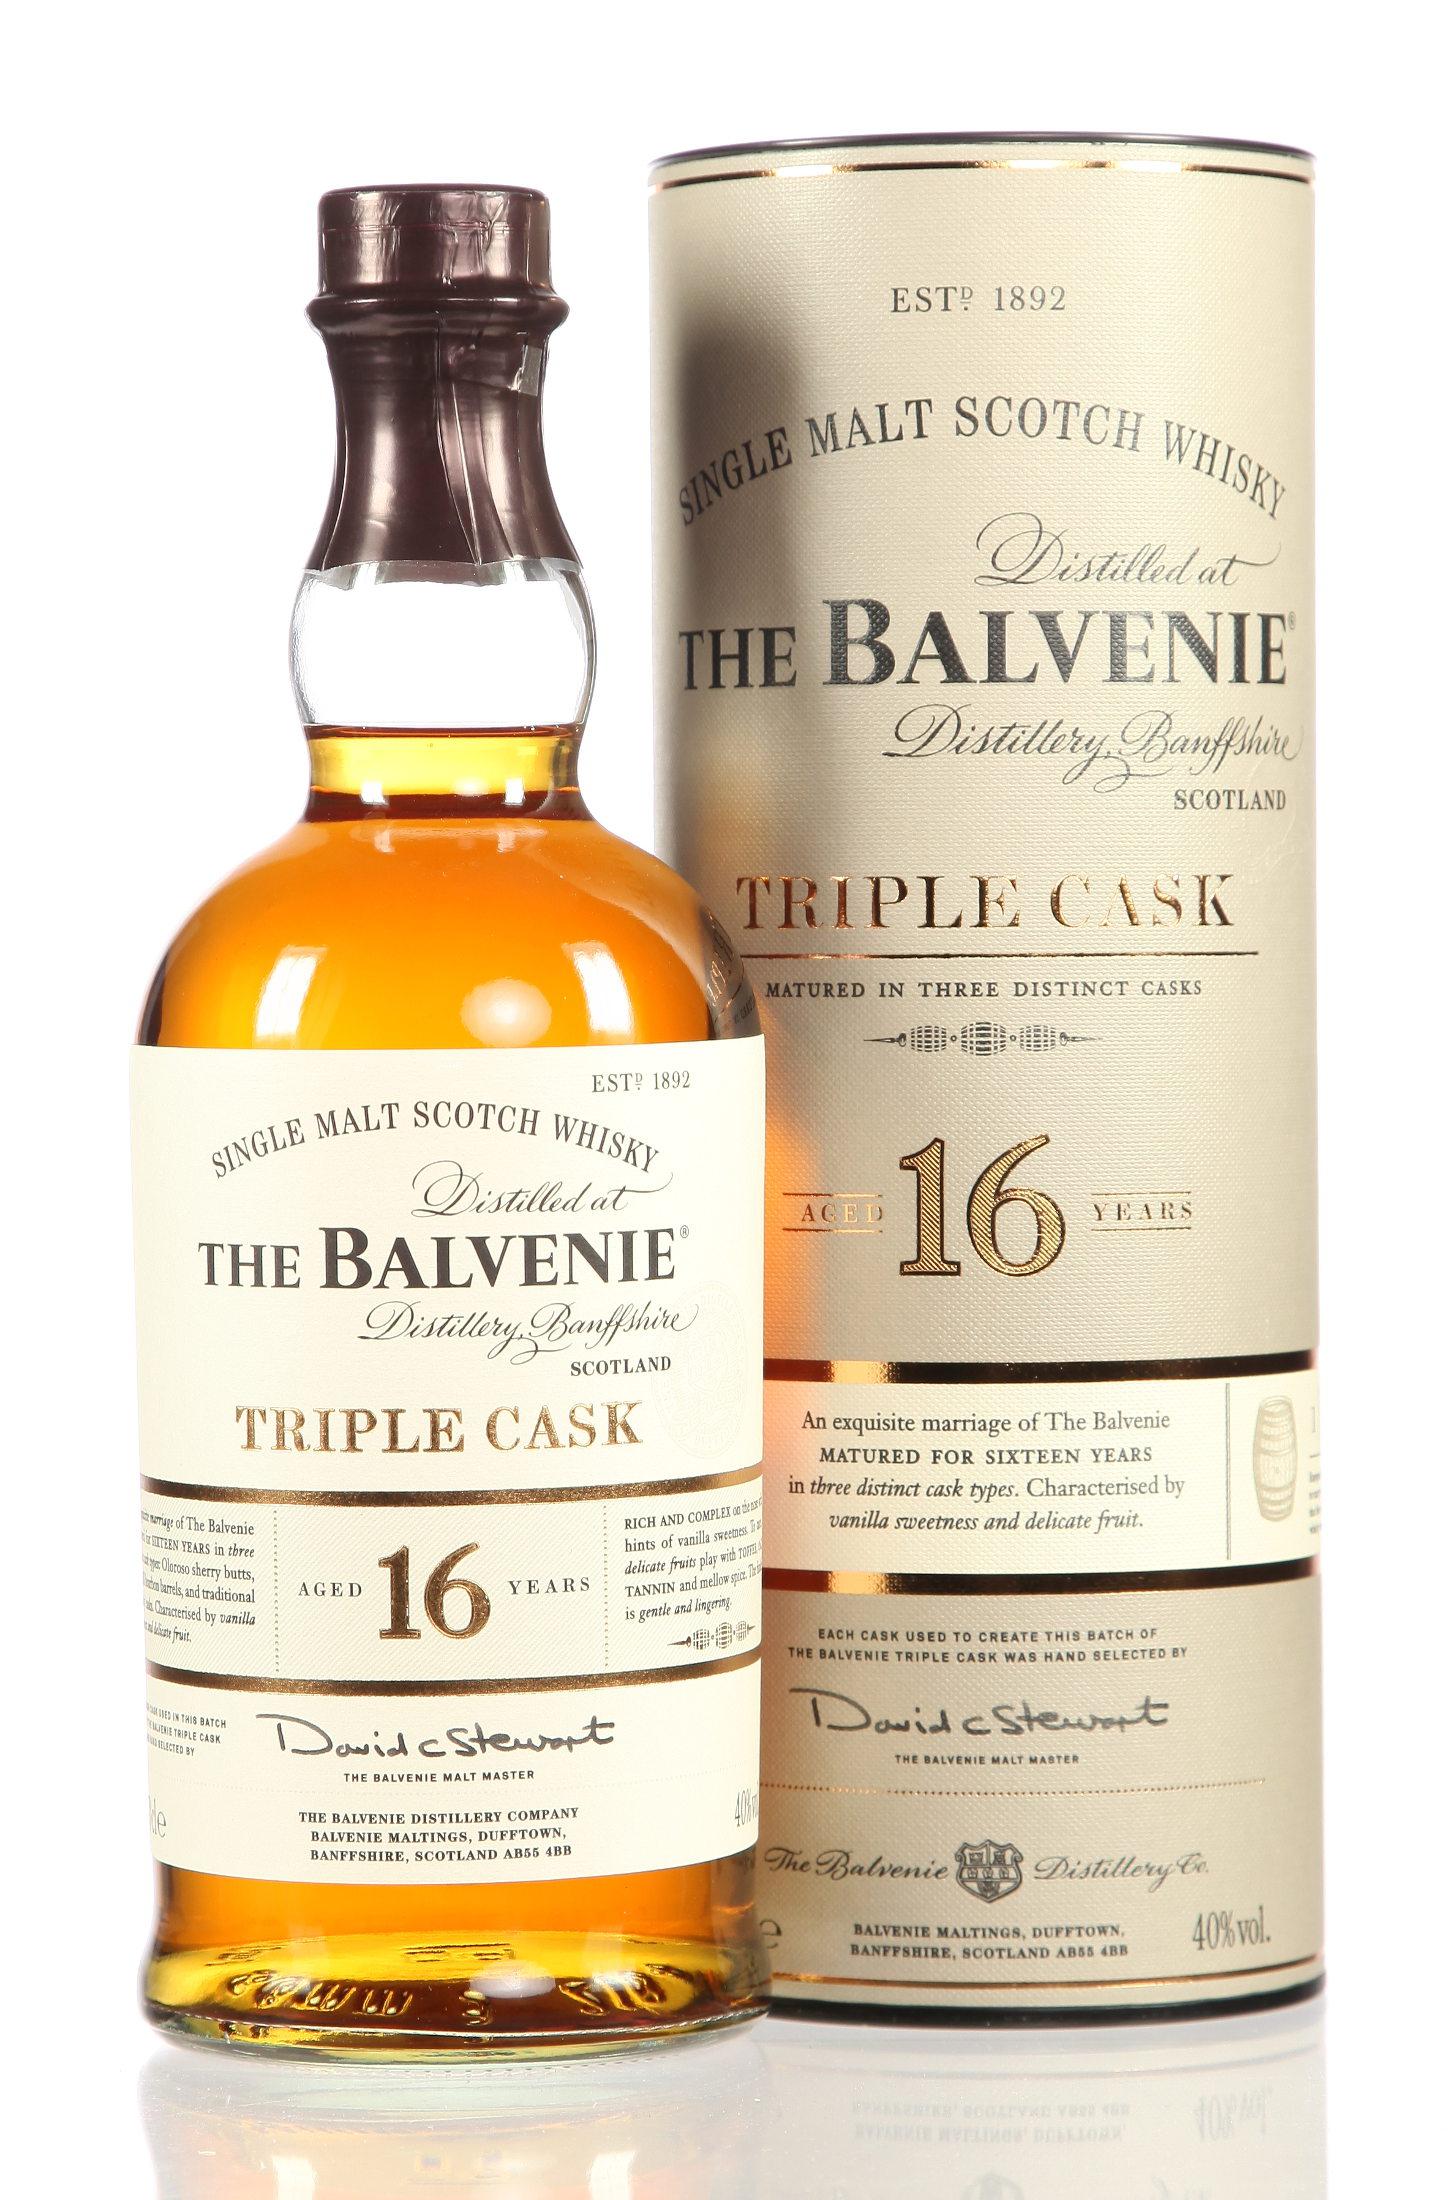 Balvenie single malt triple cask